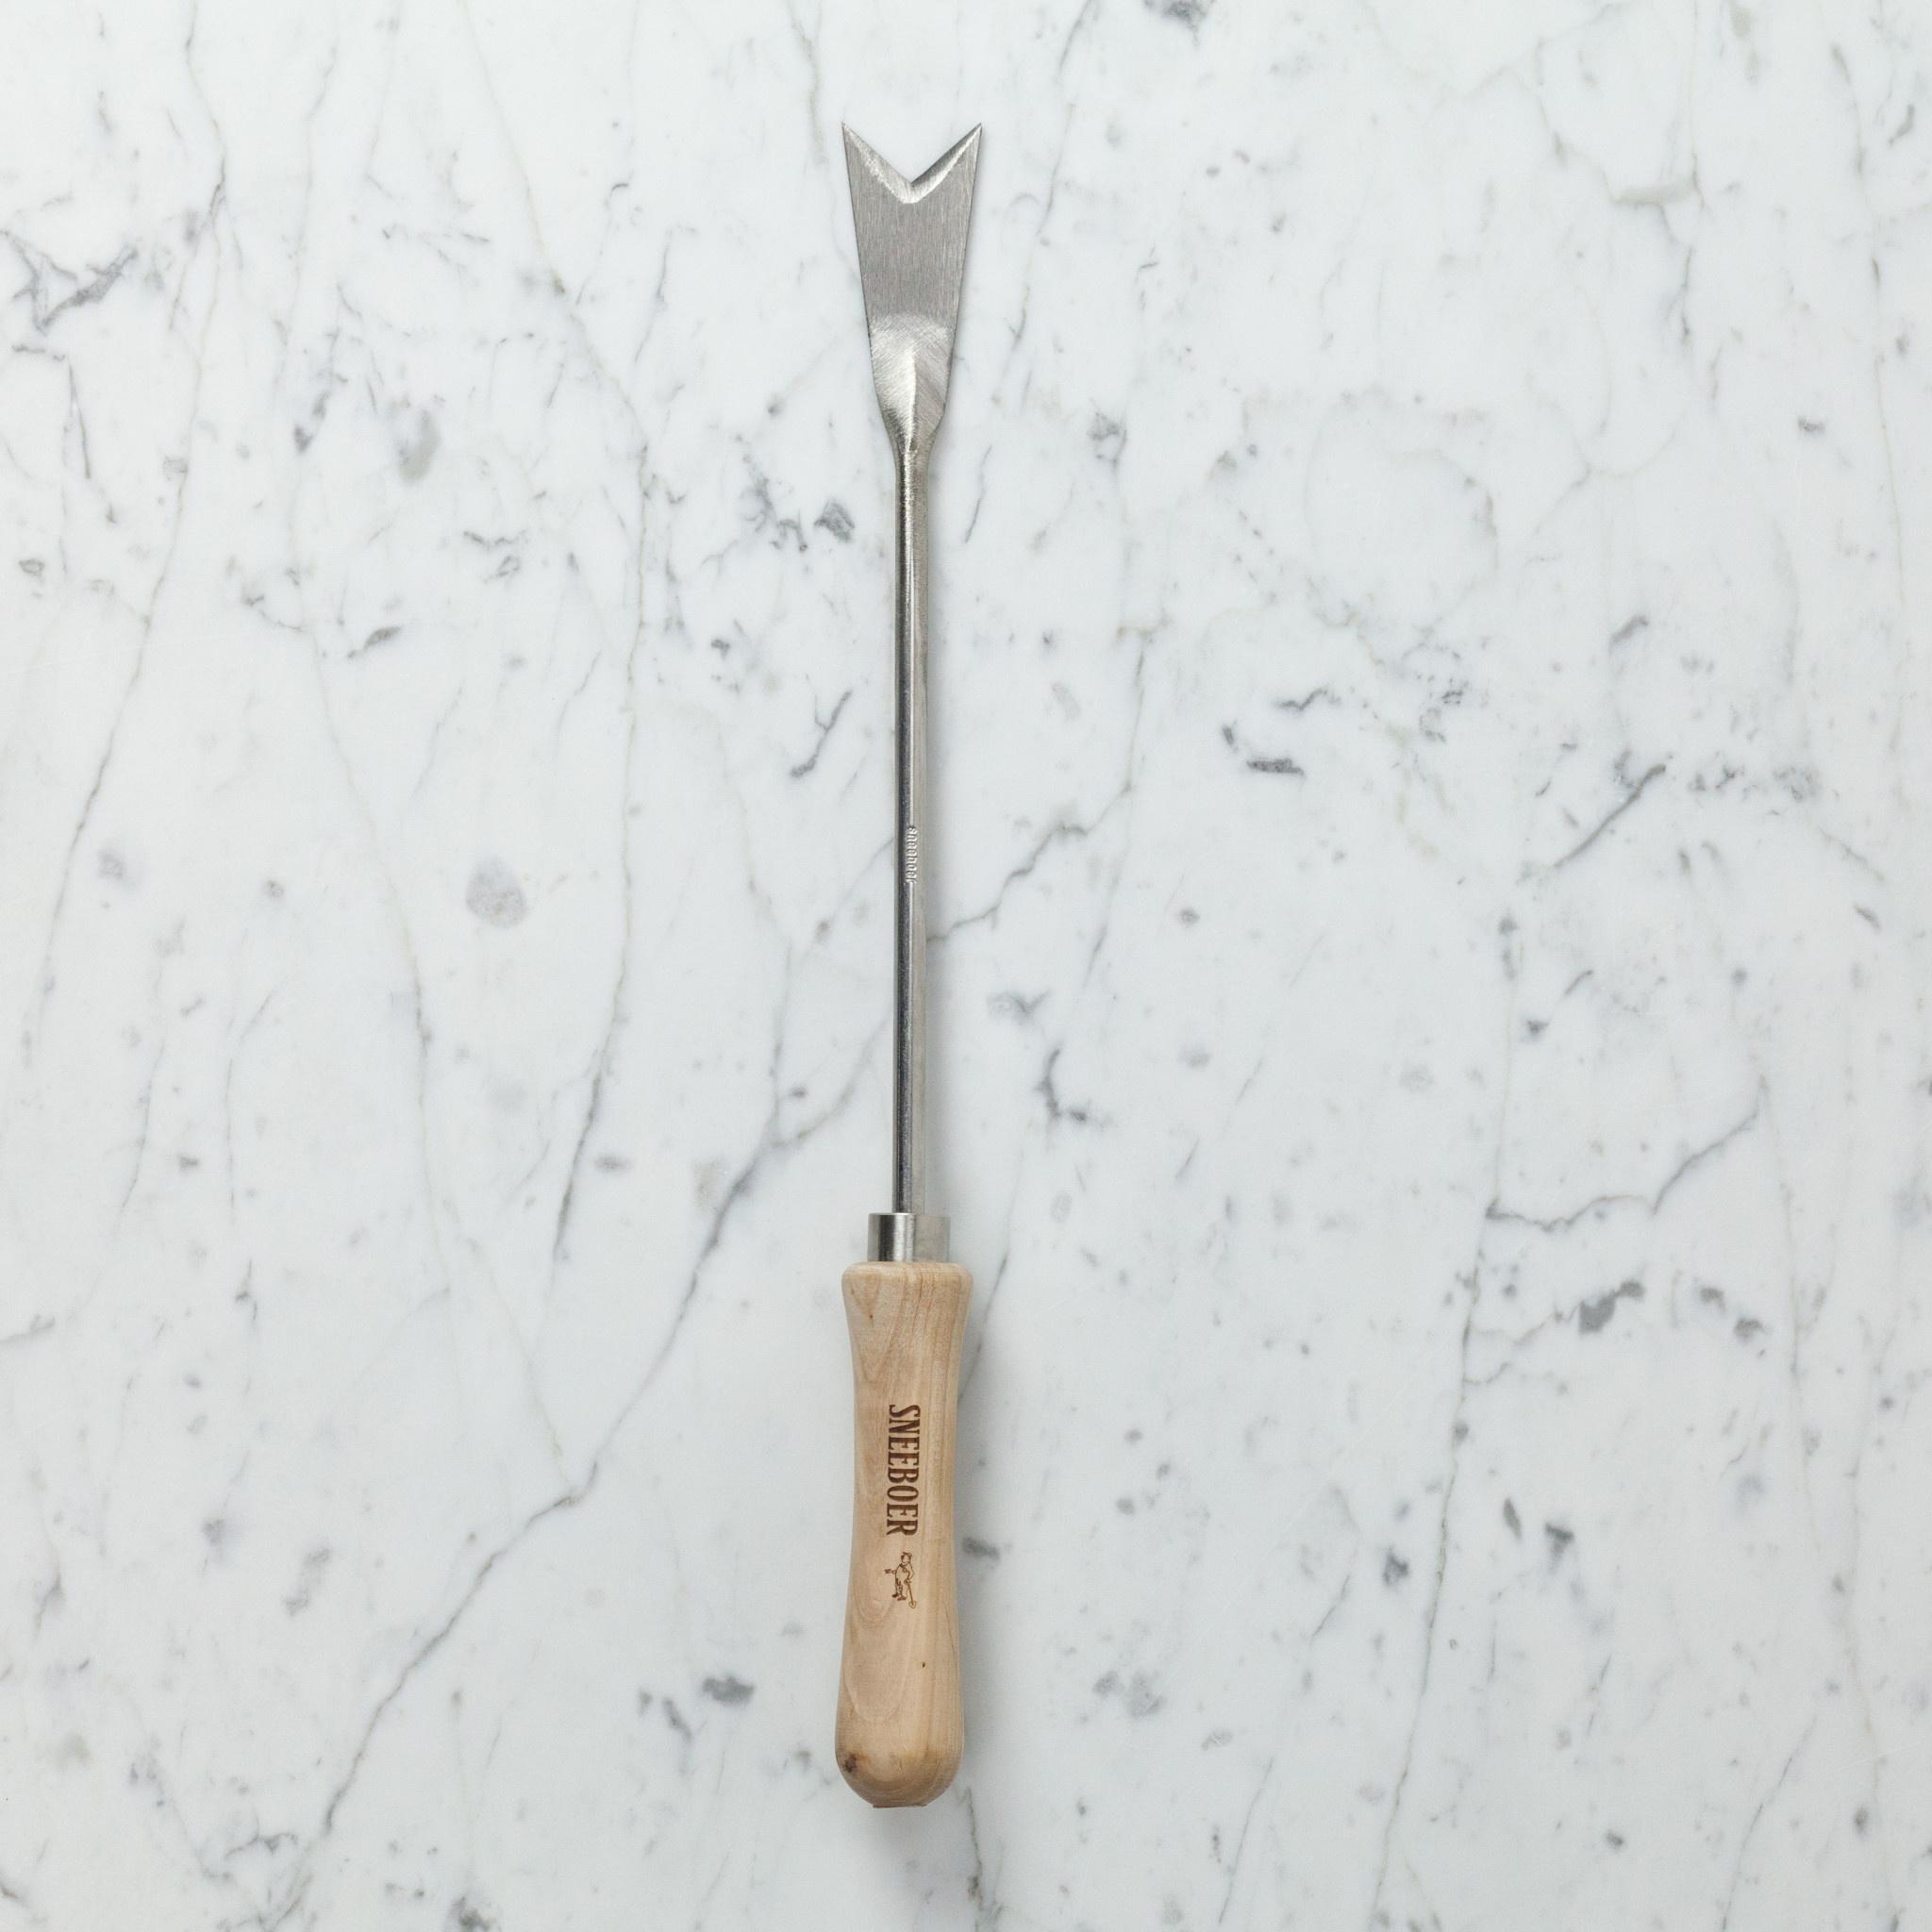 Sneeboer Hand Forged Dutch Dandelion Digger